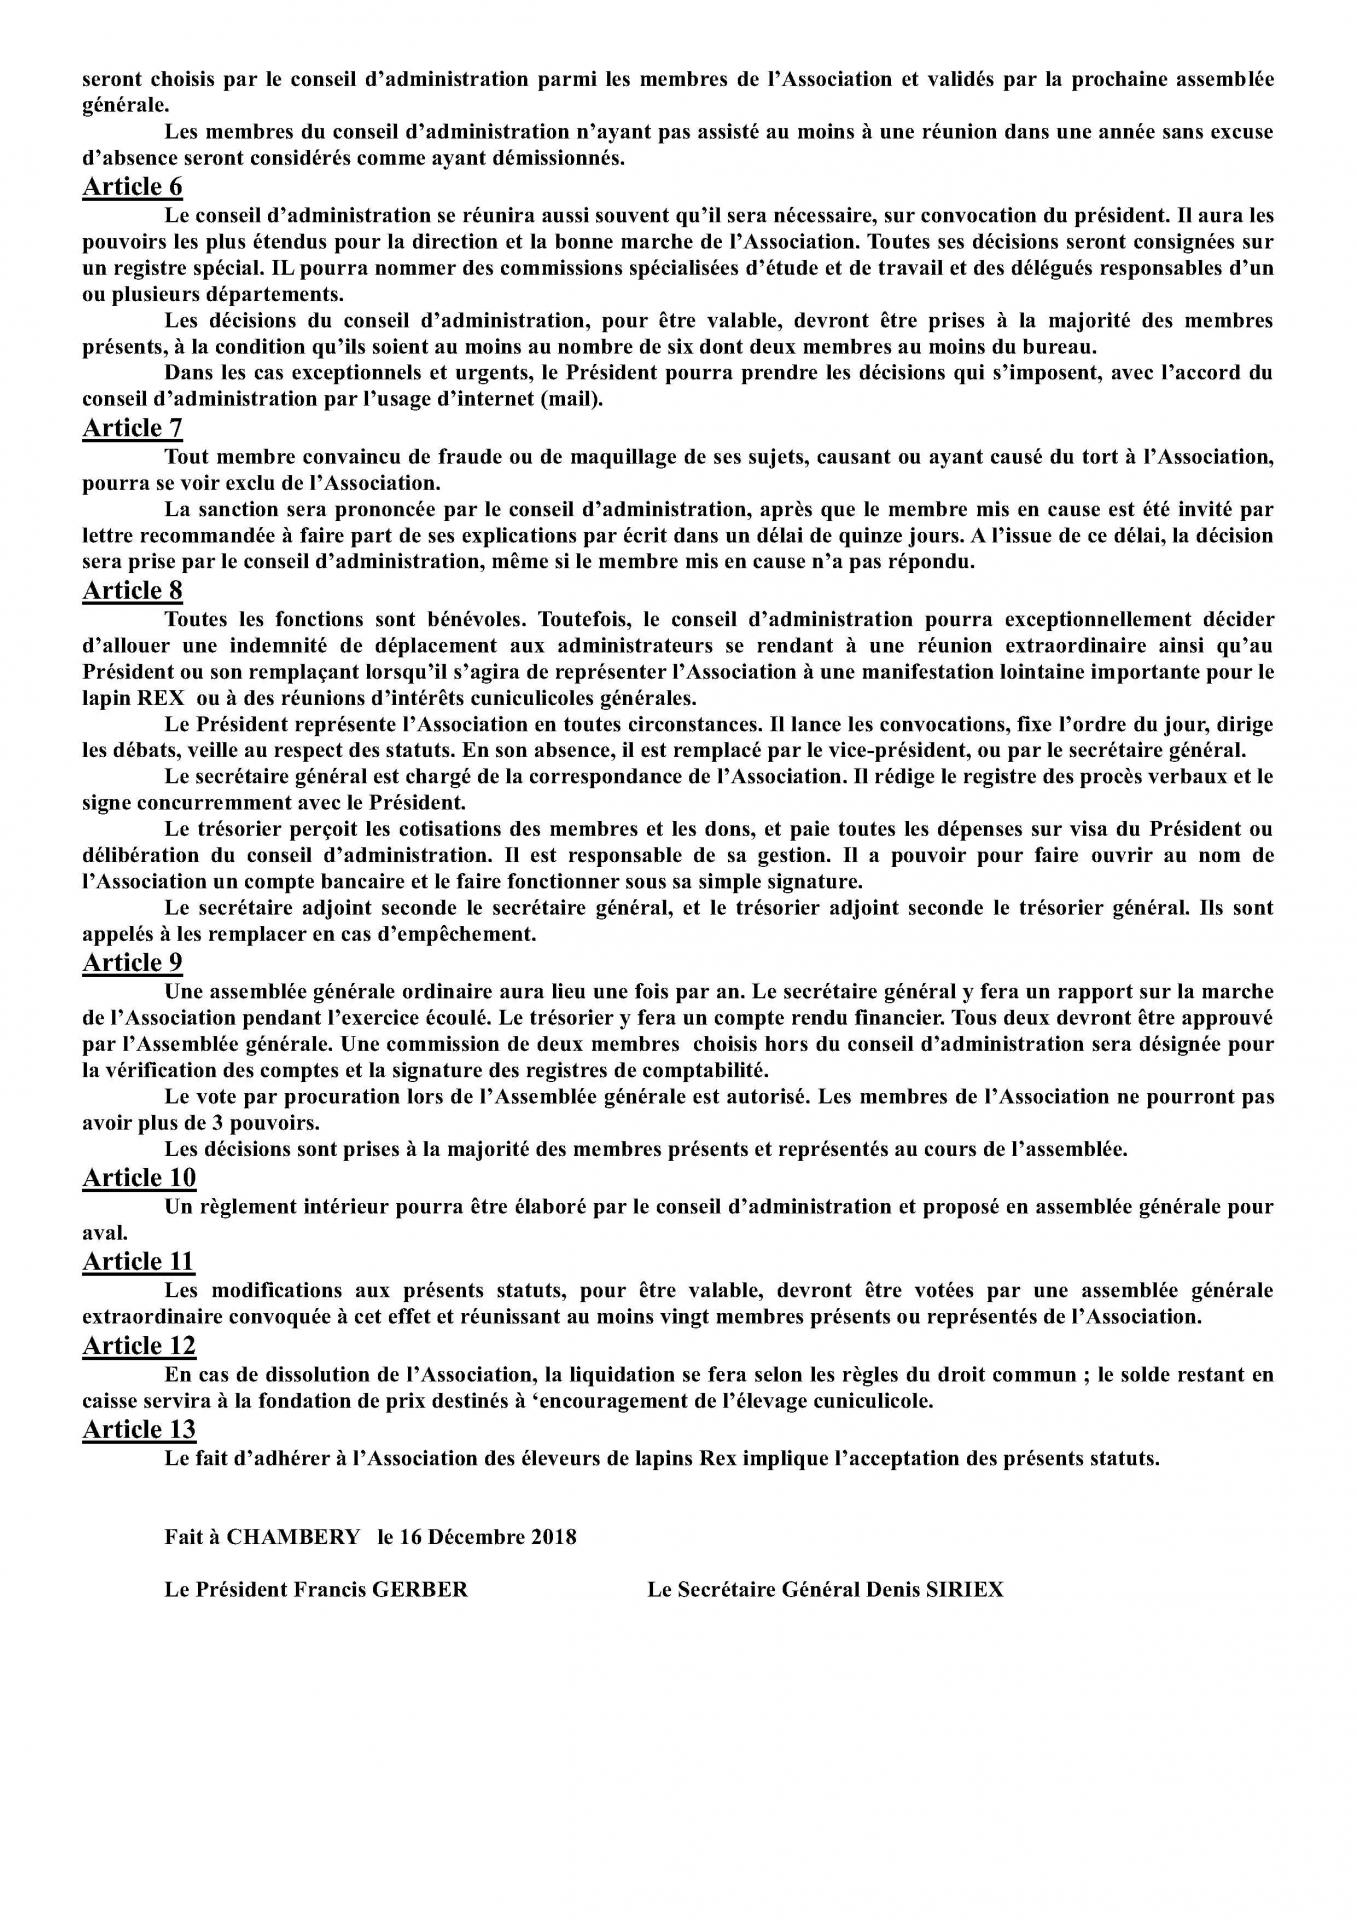 Statut club du rex 2